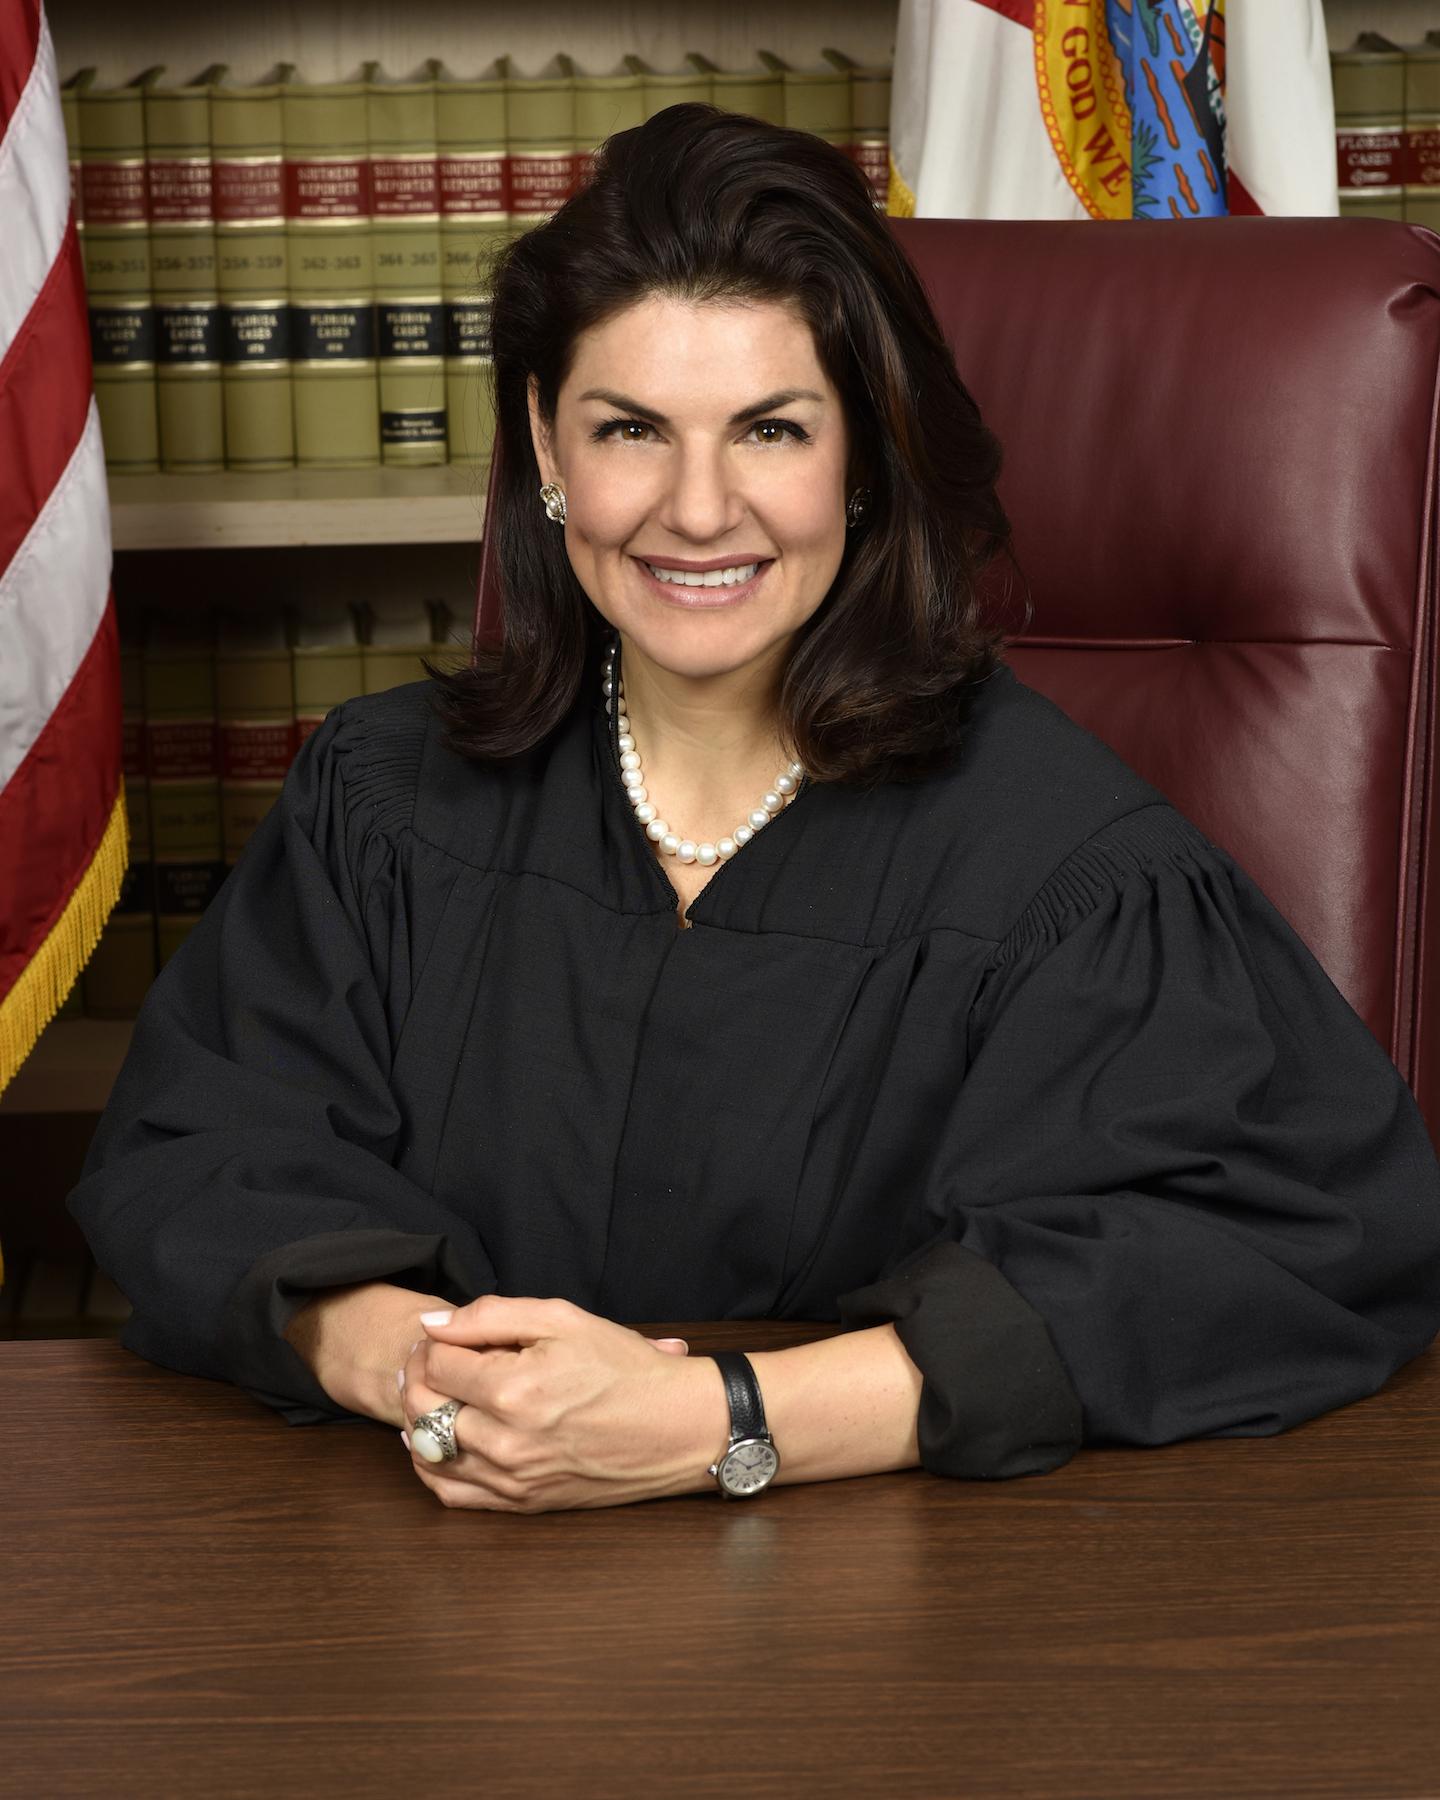 judge T.jpg